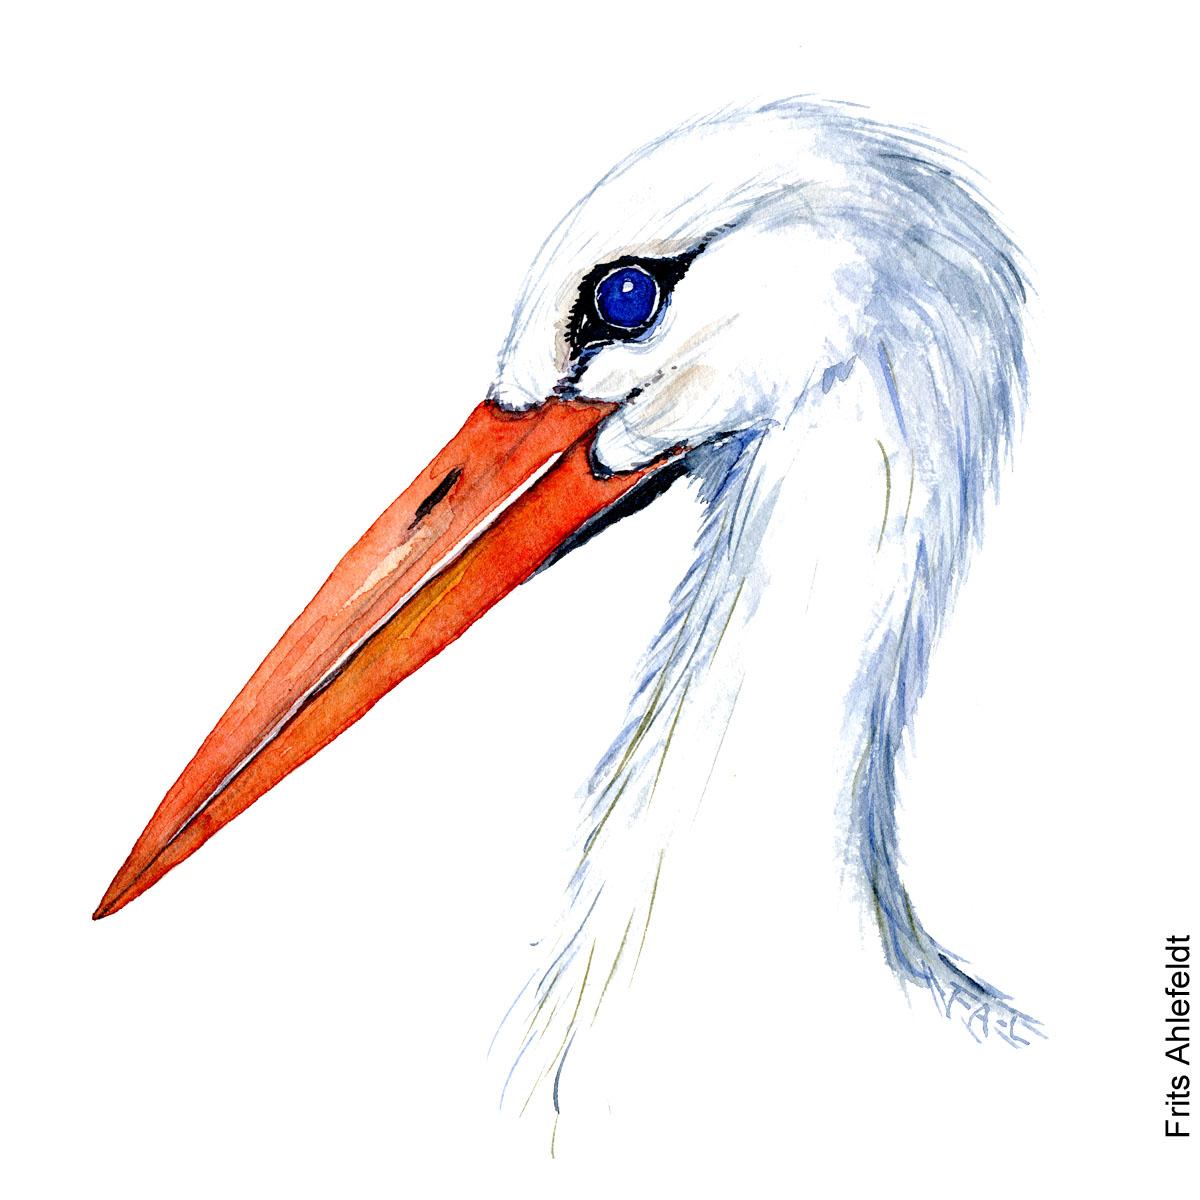 White stork head Bird watercolor illustration handmade by Frits Ahlefeldt